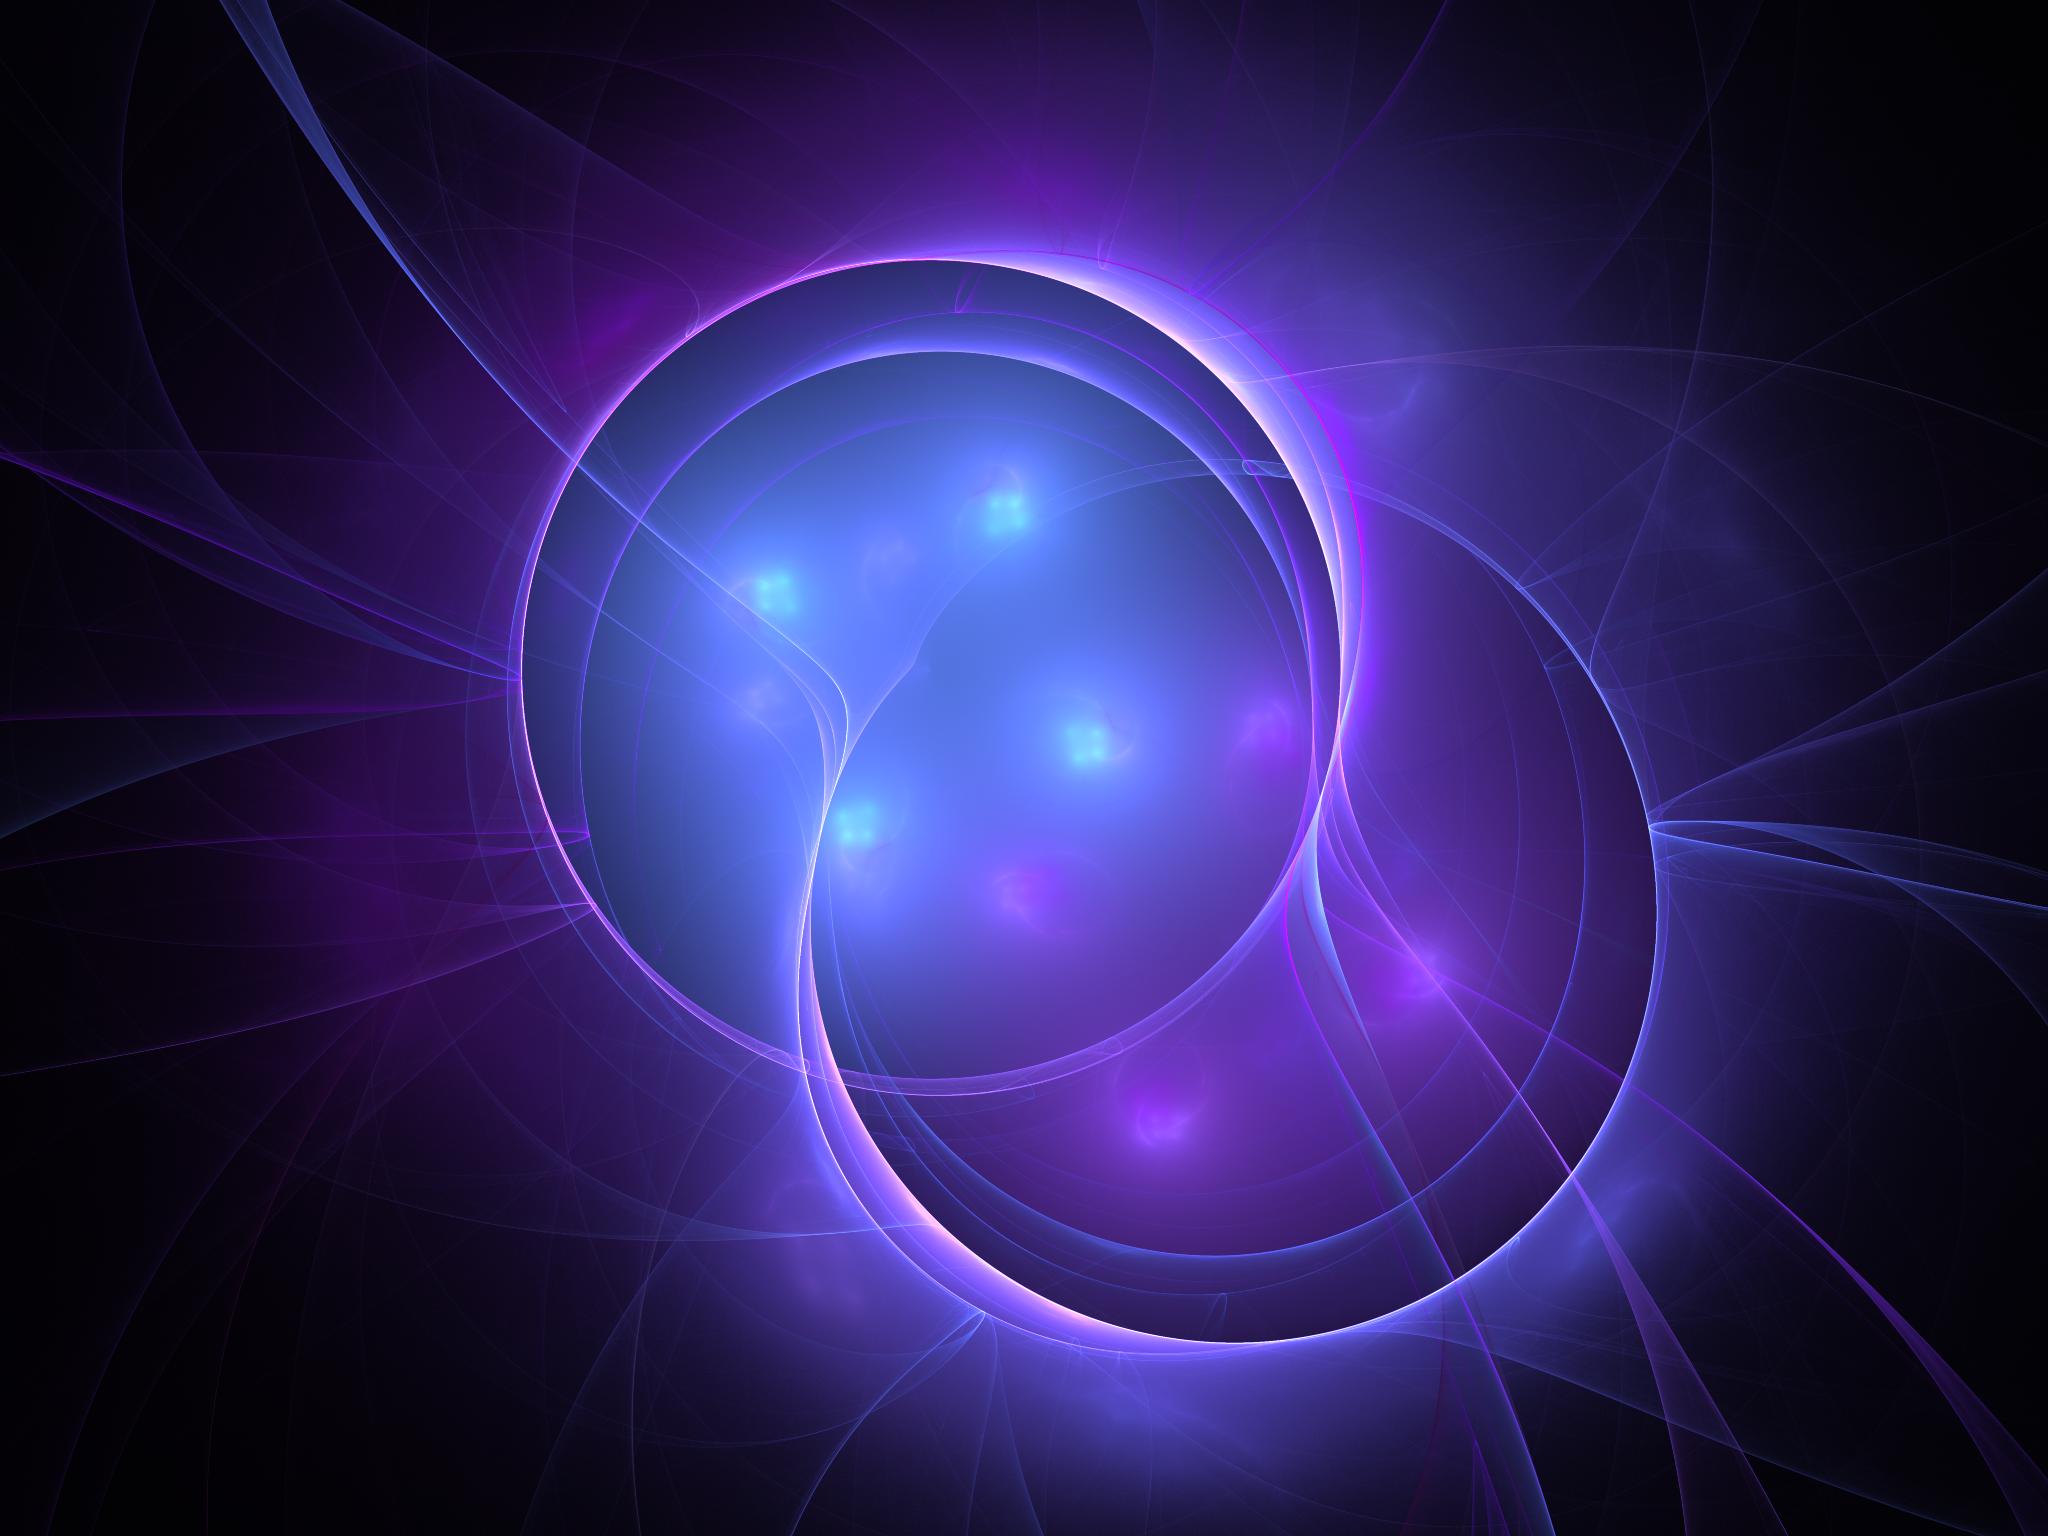 Plasma Apophysis Software Digital Art Violet Energy Circle 2048x1536